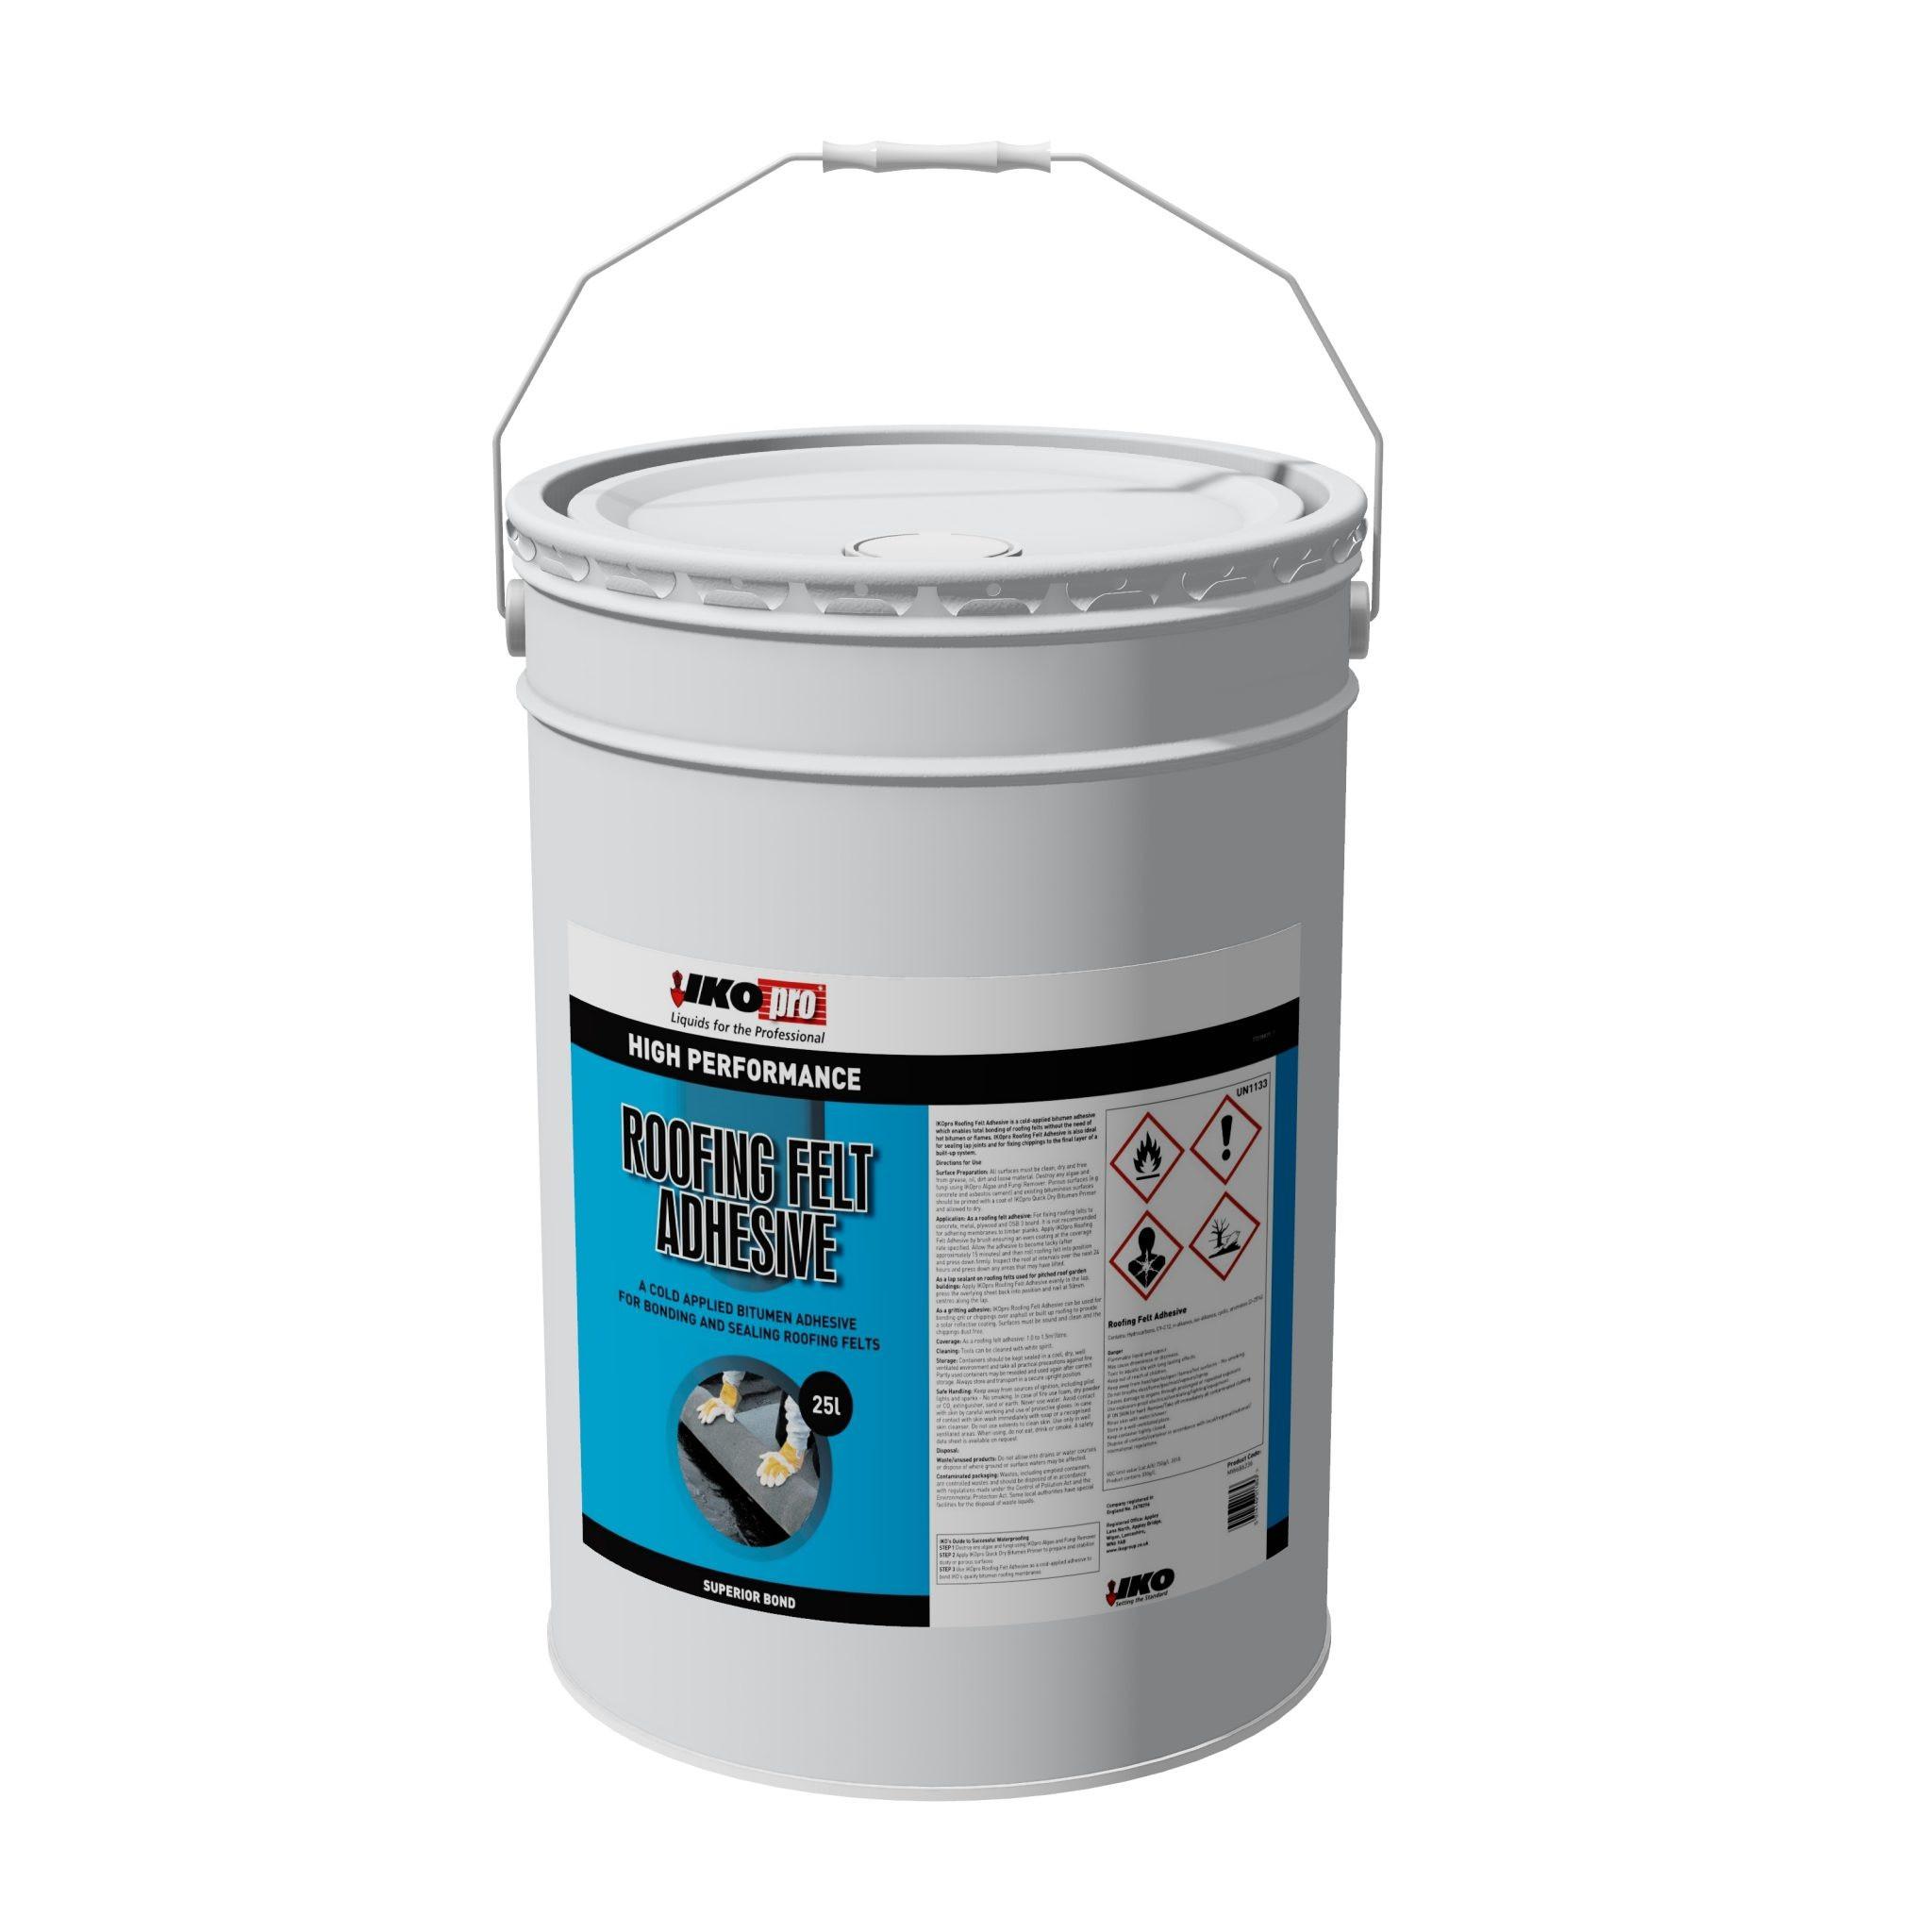 Iko-Pro Roofing Felt Adhesive 25Ltr